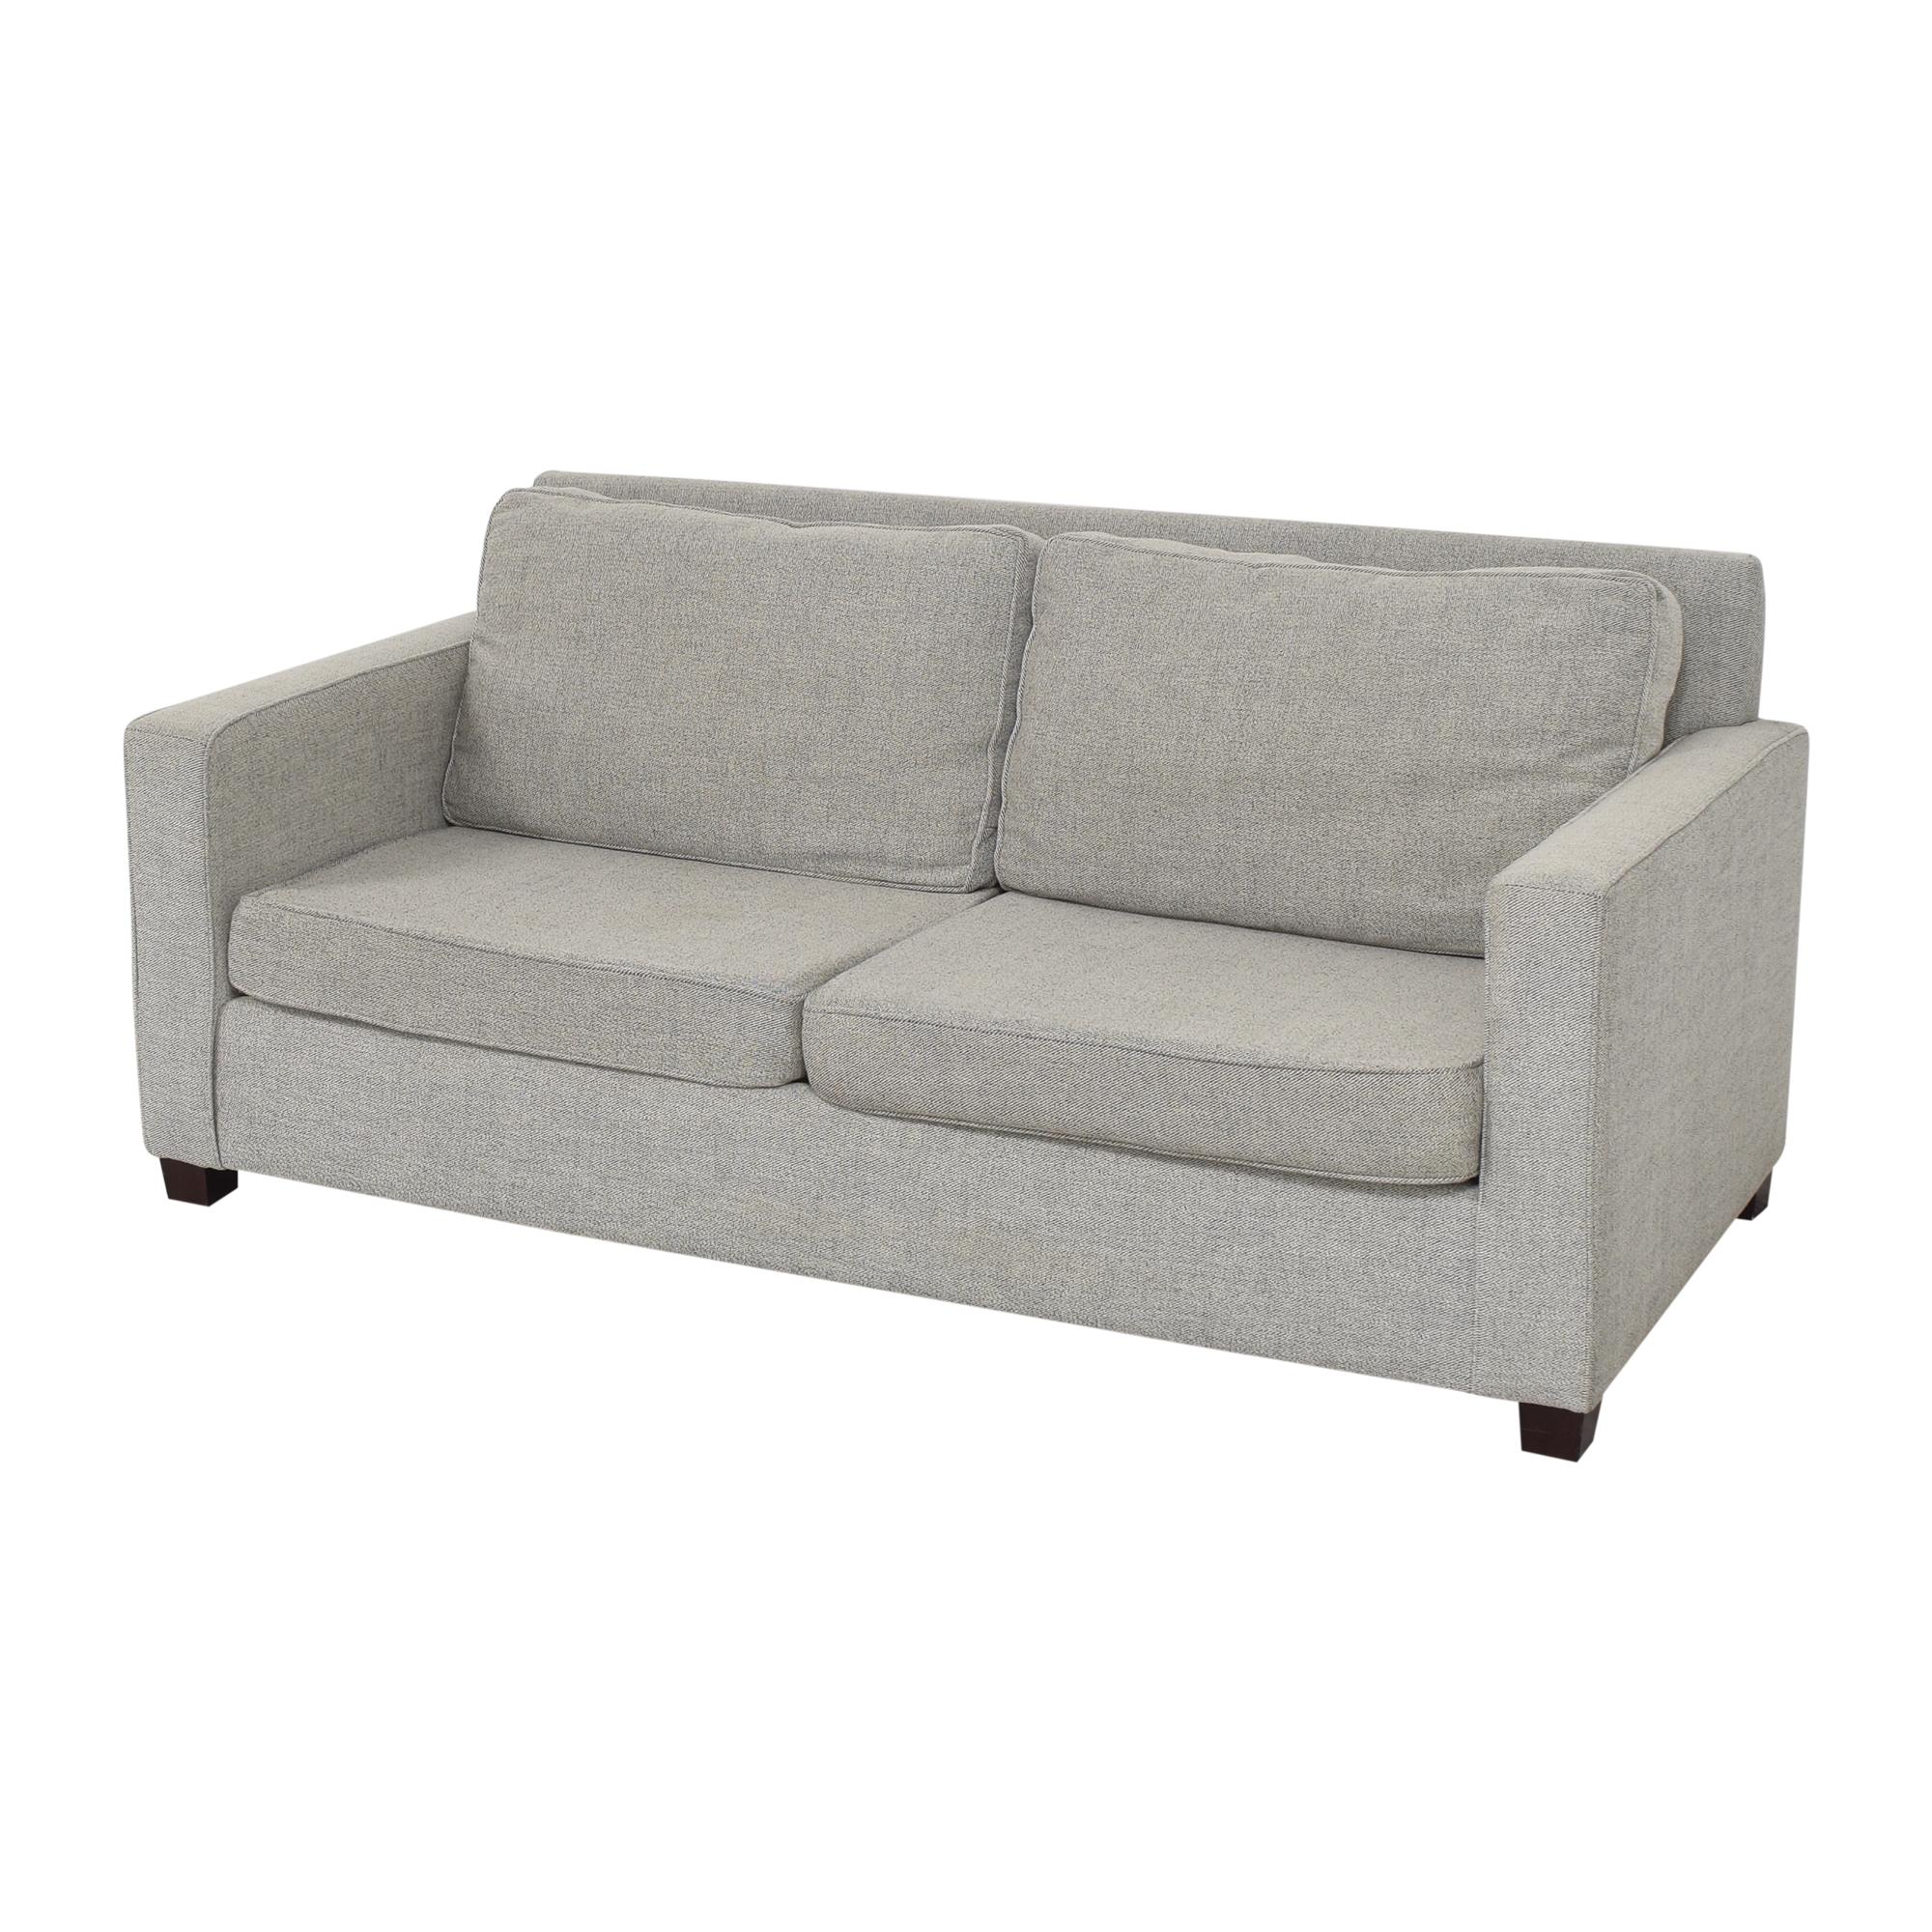 West Elm Henry Two Cushion Sofa / Classic Sofas